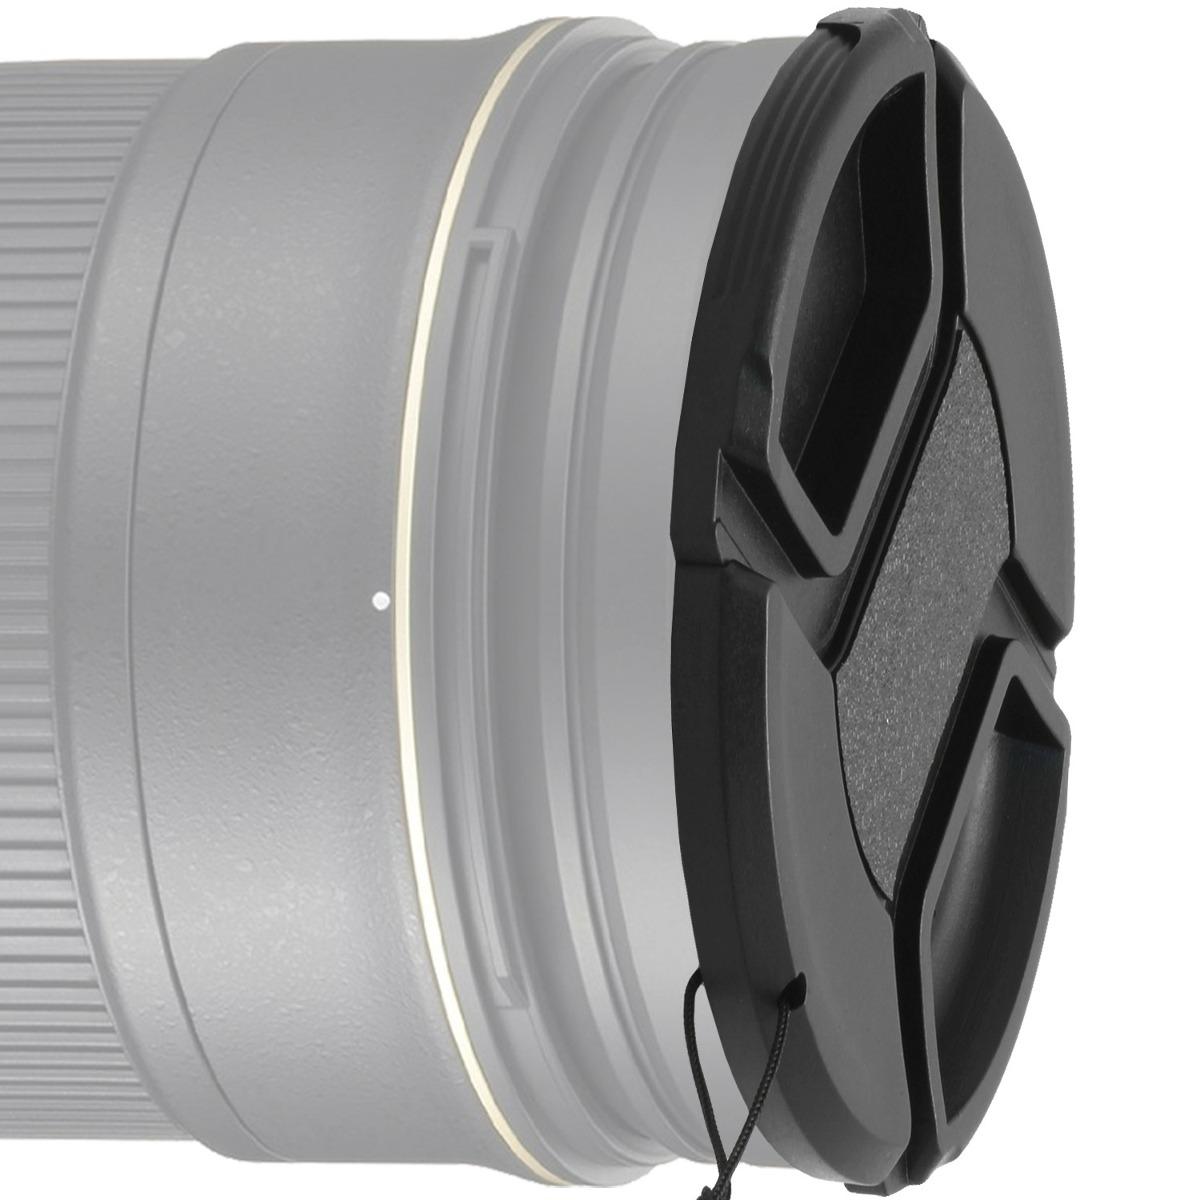 Tampa Preta Para Canon M M2 Ef 22mm F 20 Stm 43 R 2499 Carregando Zoom